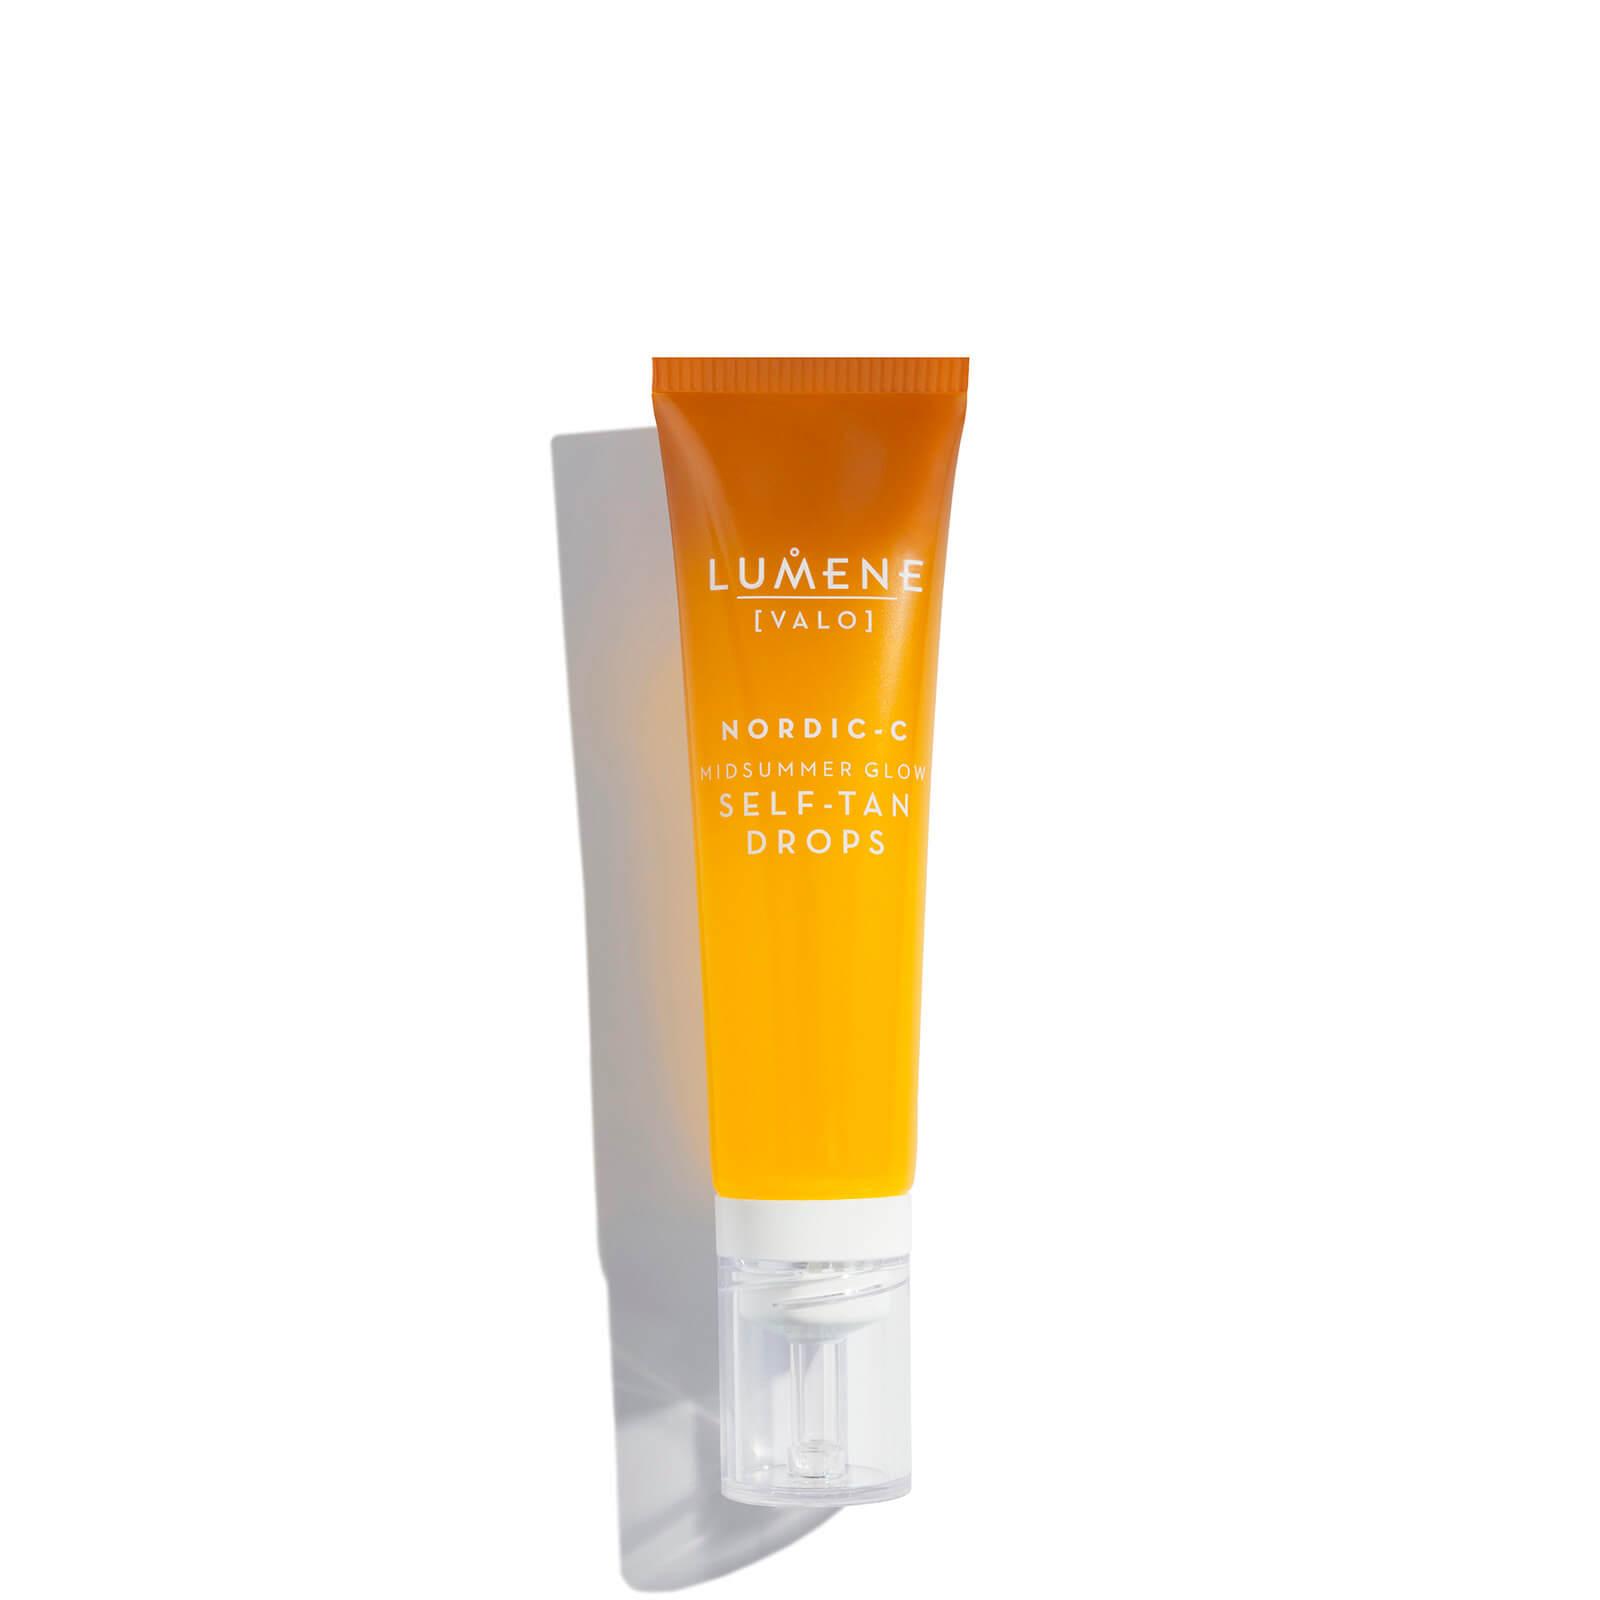 Купить Lumene Nordic-C [VALO] Self-Tan Drops 30ml